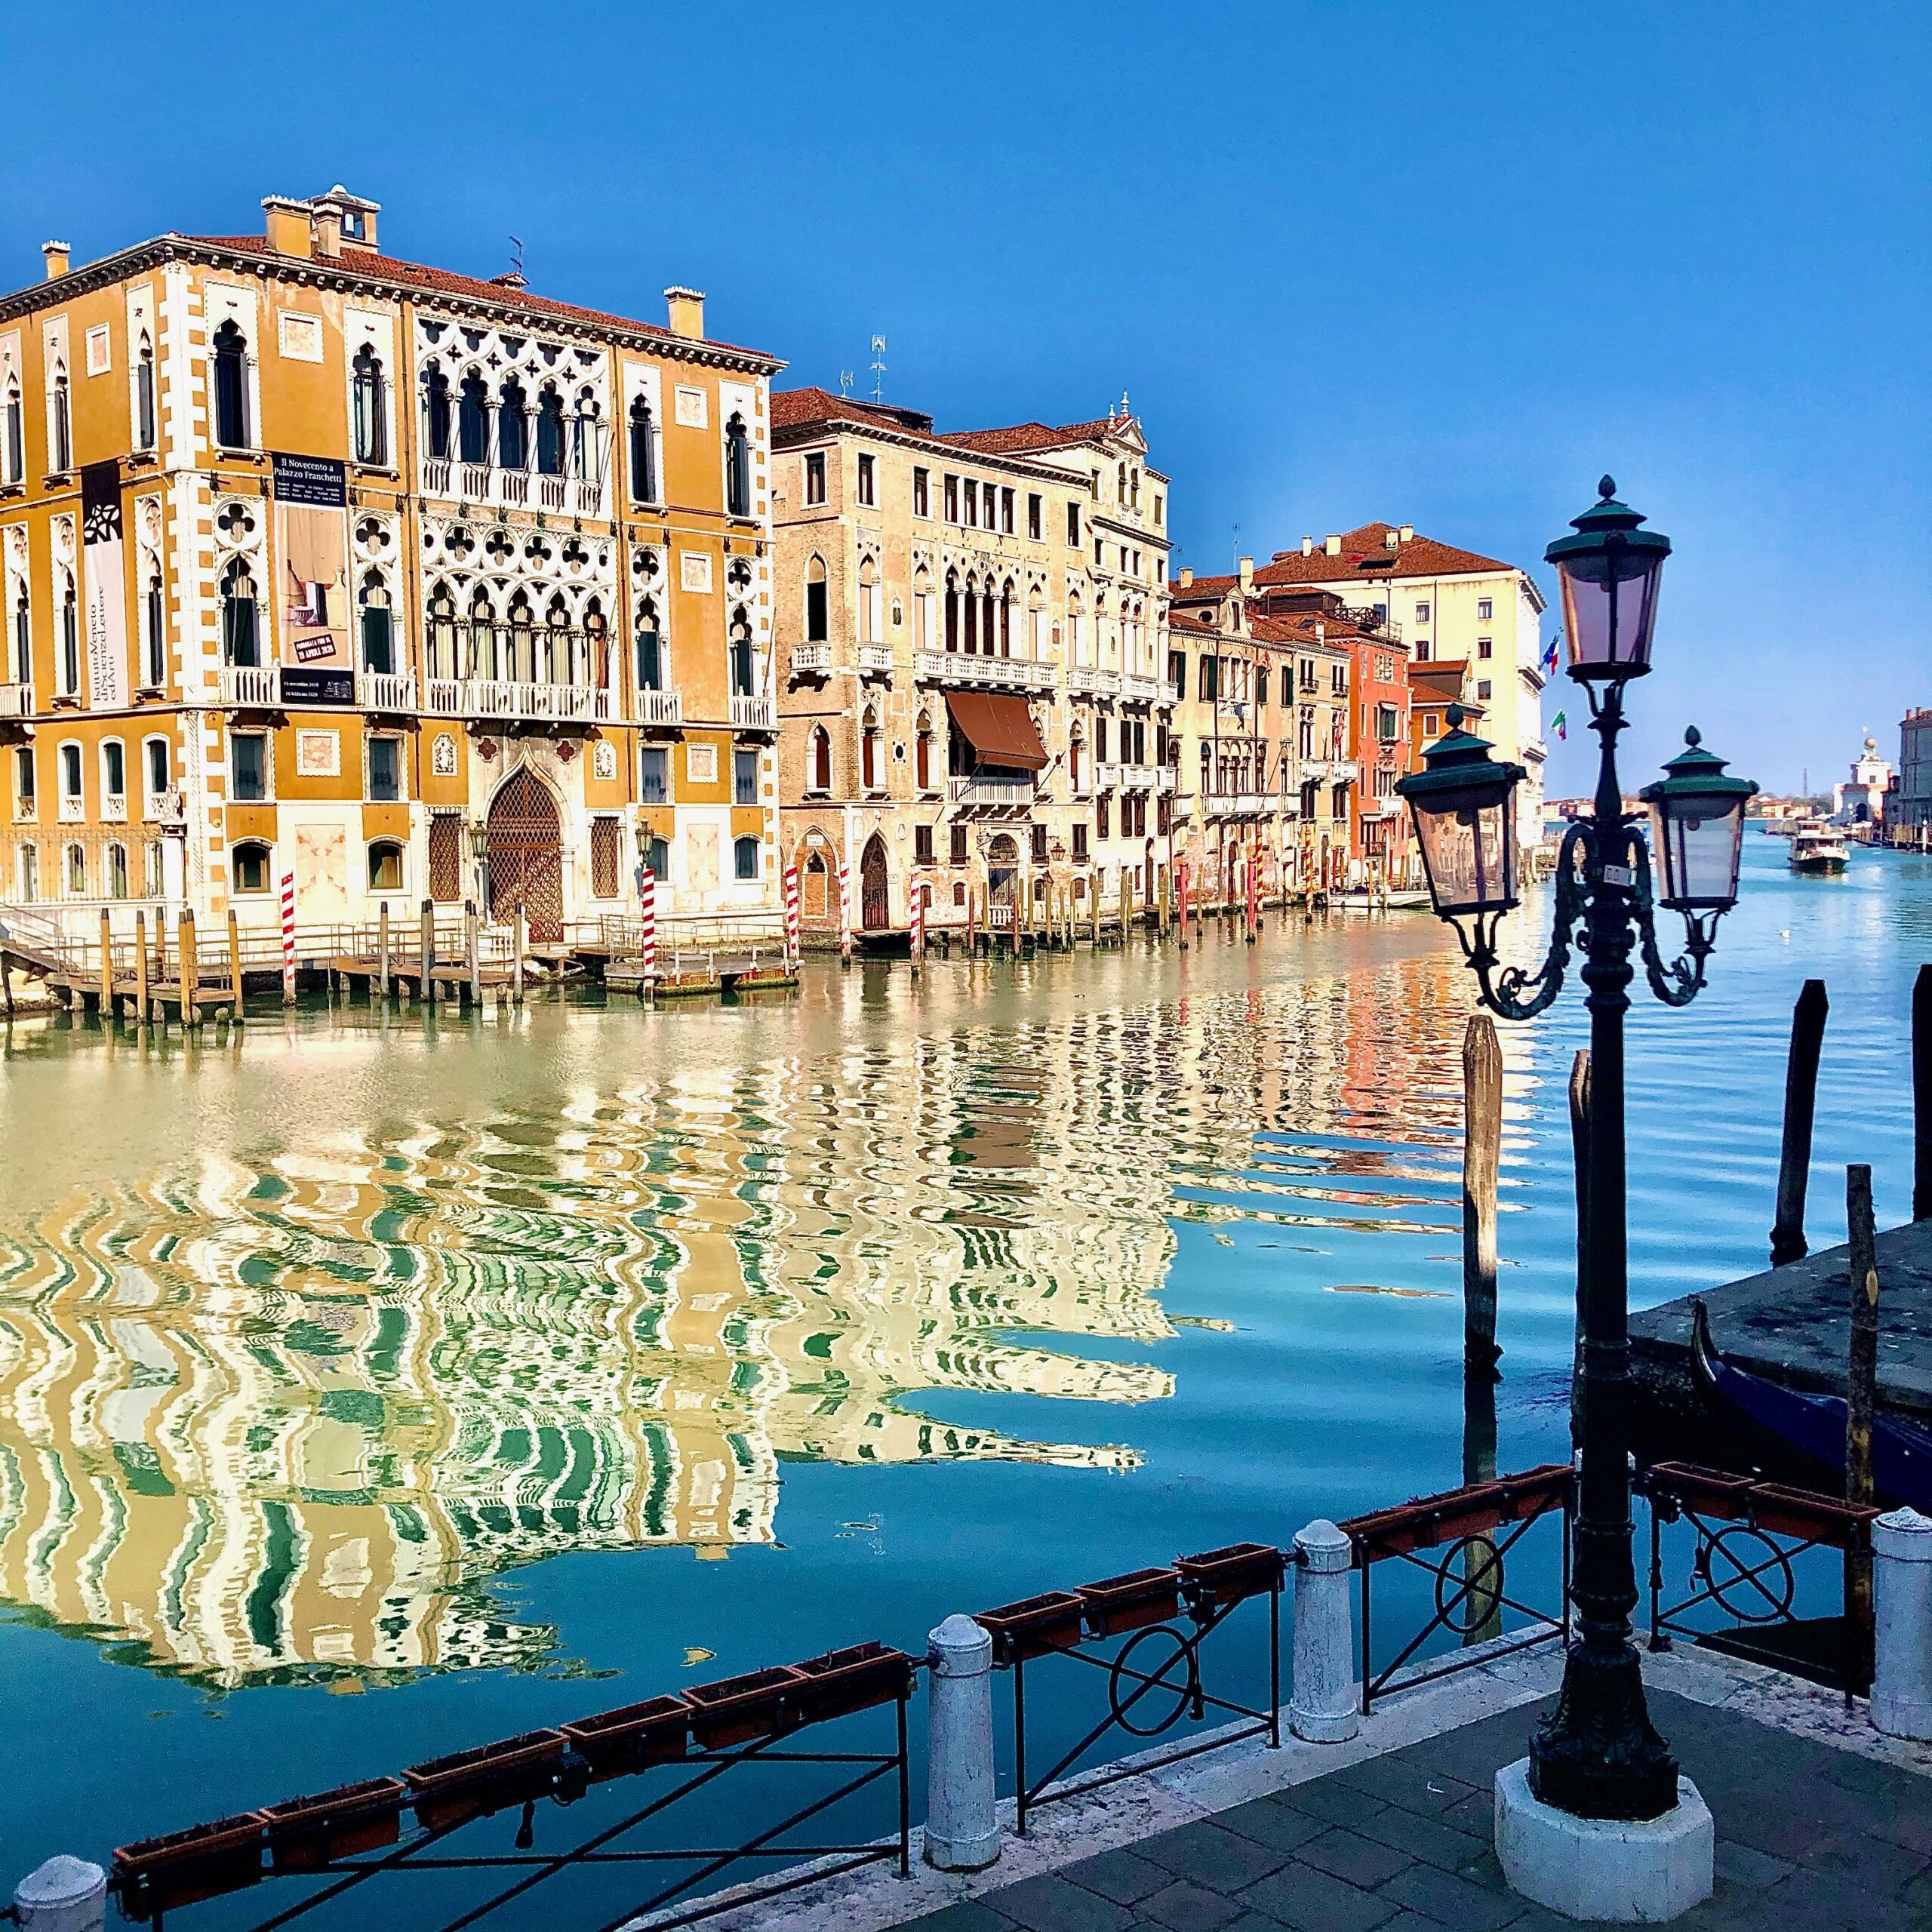 Wish Magazine 04.09.2020: Venice Regained